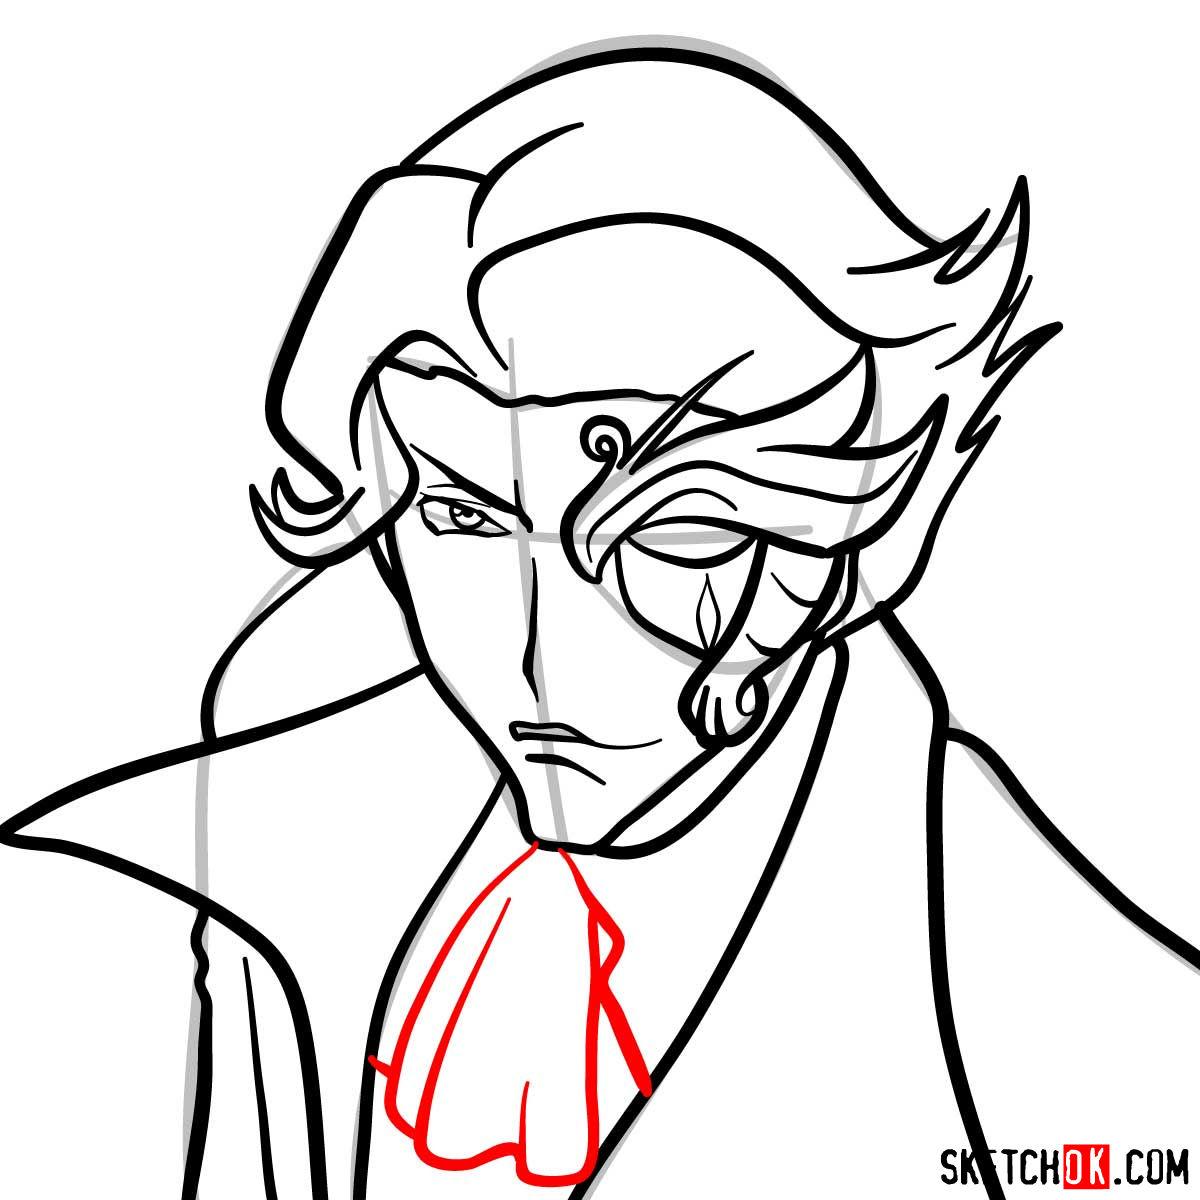 How to draw Jeremiah Gottwald | Code Geass anime - step 09